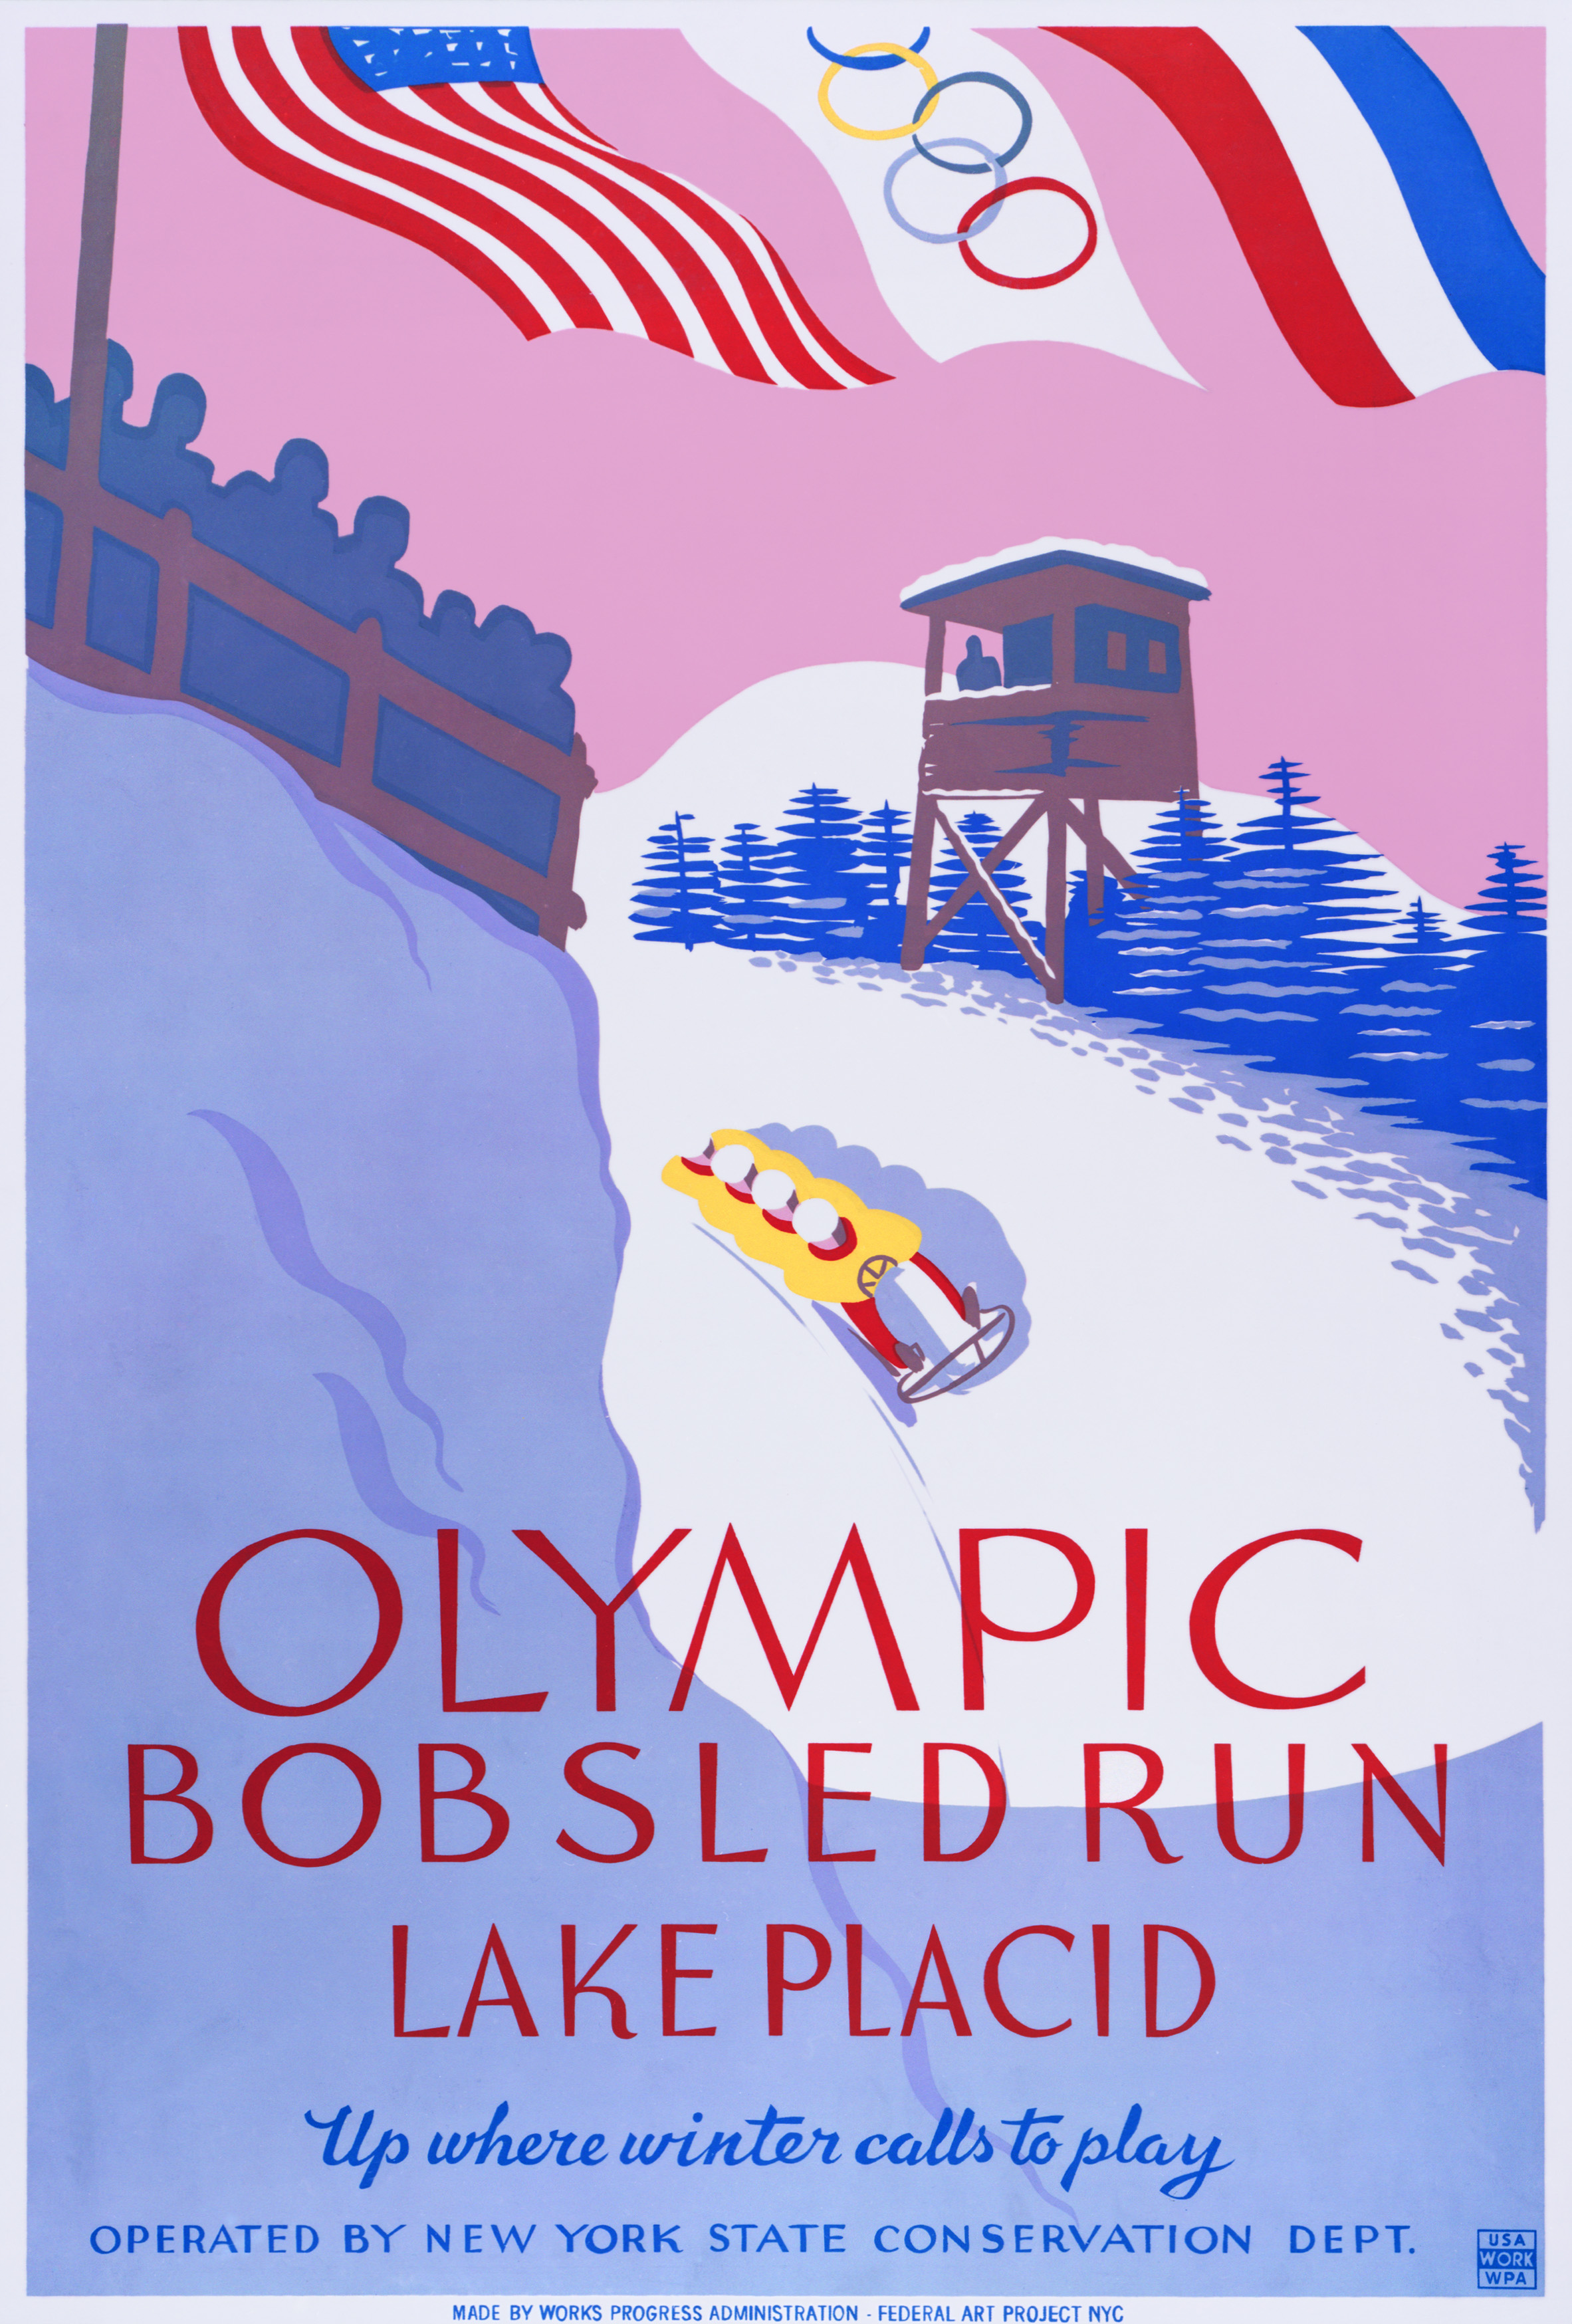 Lake_Placid_Olympic_bobsled_run,_WPA_poster,_ca._1937.jpg